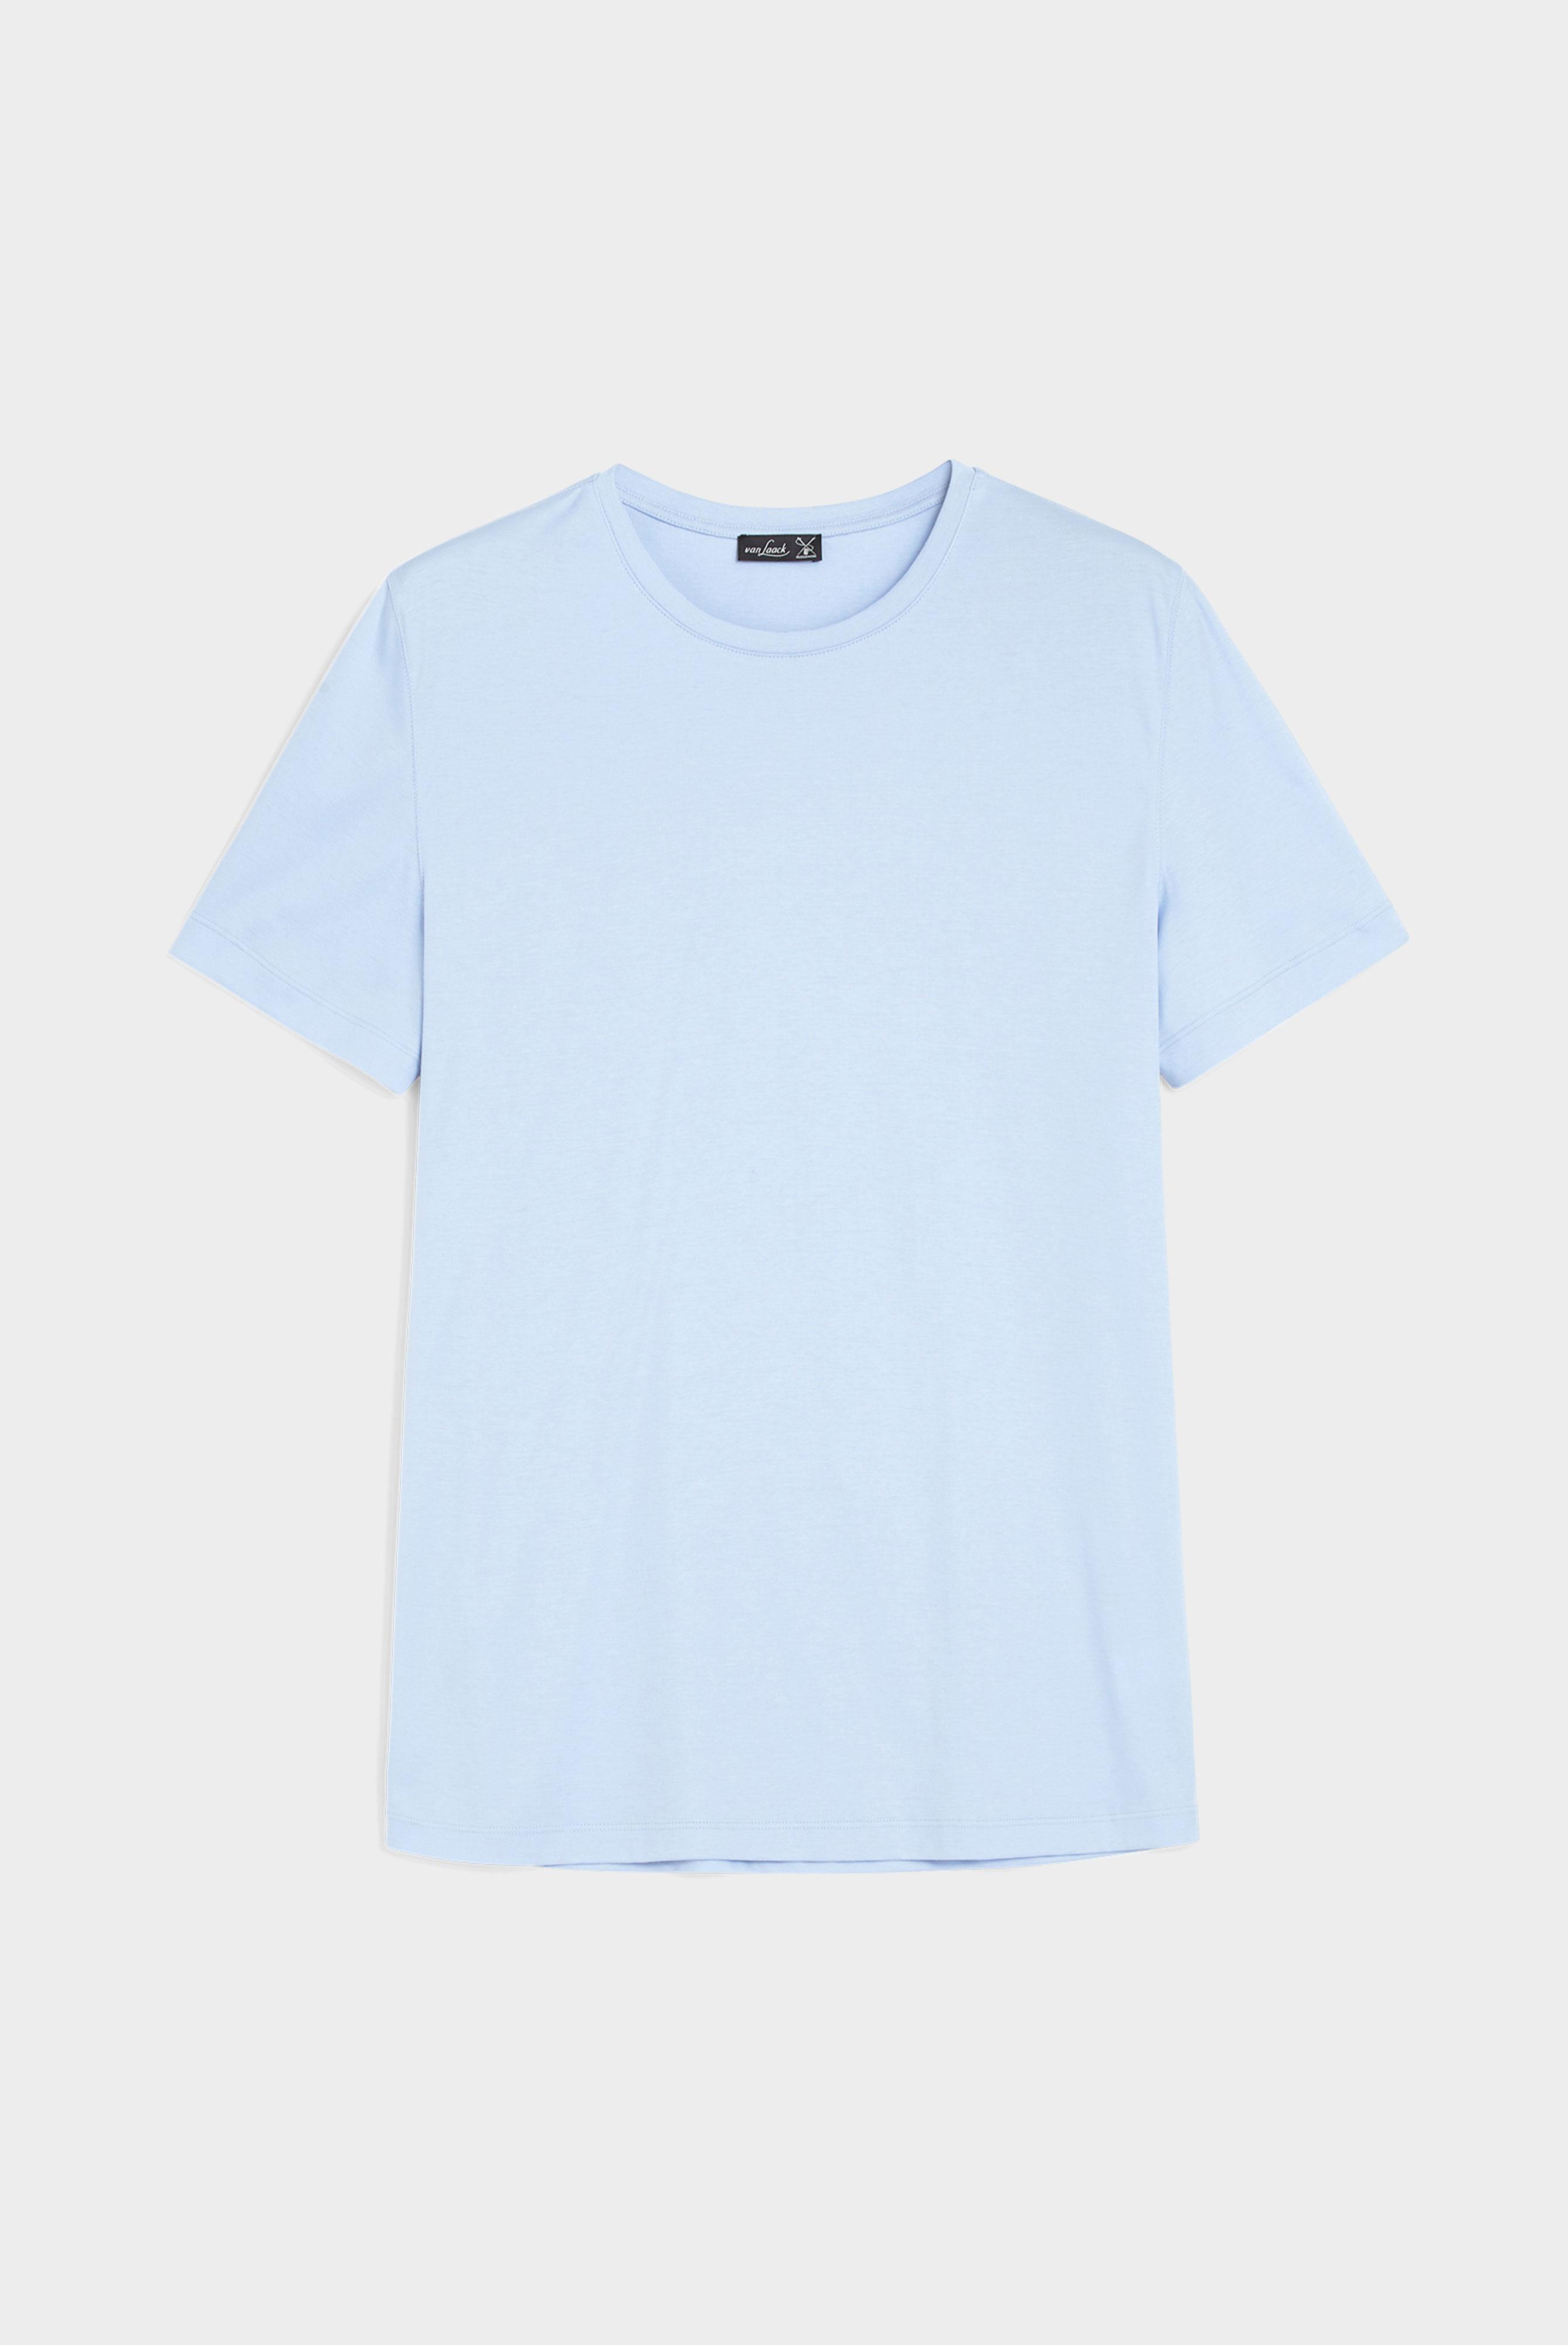 Clothing+M-PARO+20.1717.UX.180031.720.M